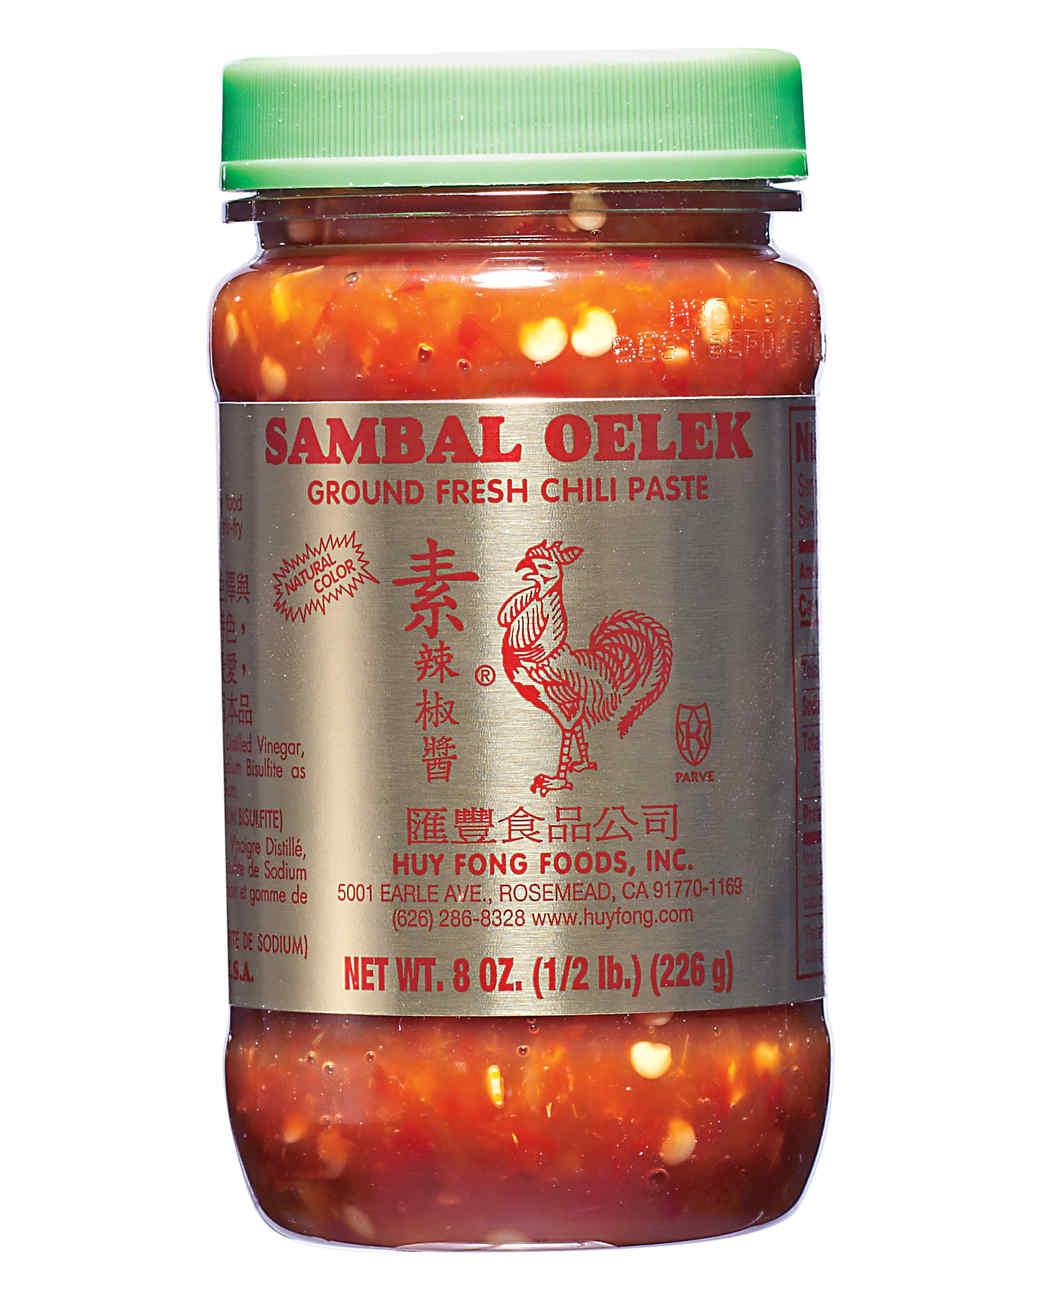 sambal-oelek-md110234.jpg